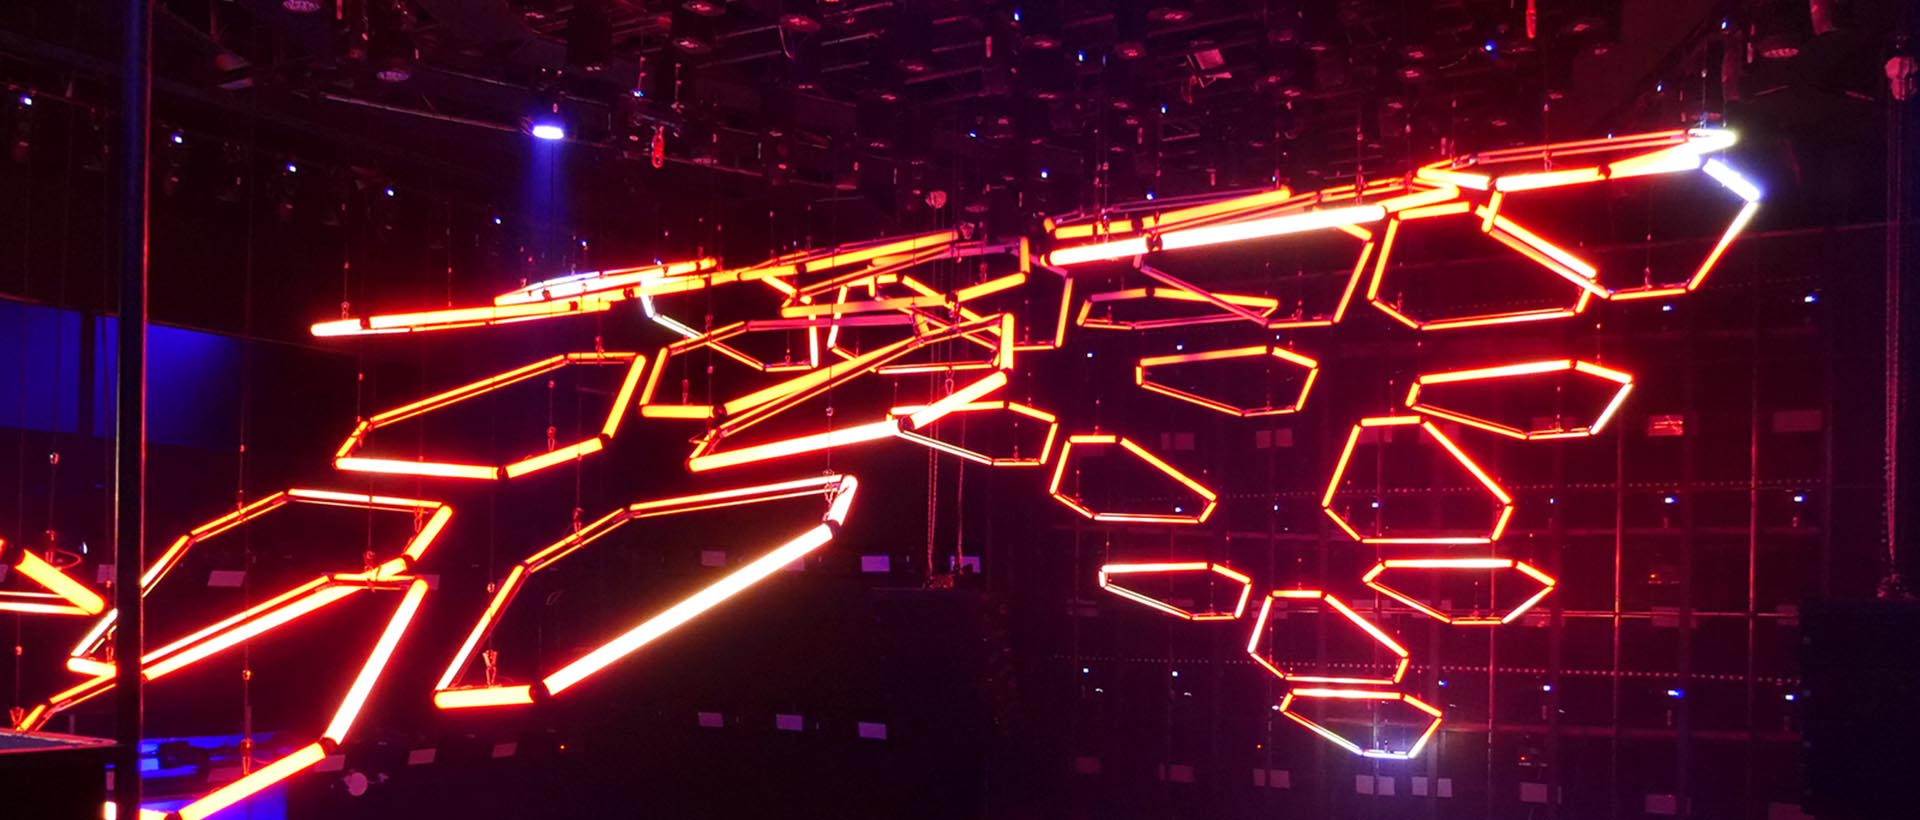 SUPER HOUSE Night club kinetic lighting system Wholesale Kinetic Lighting